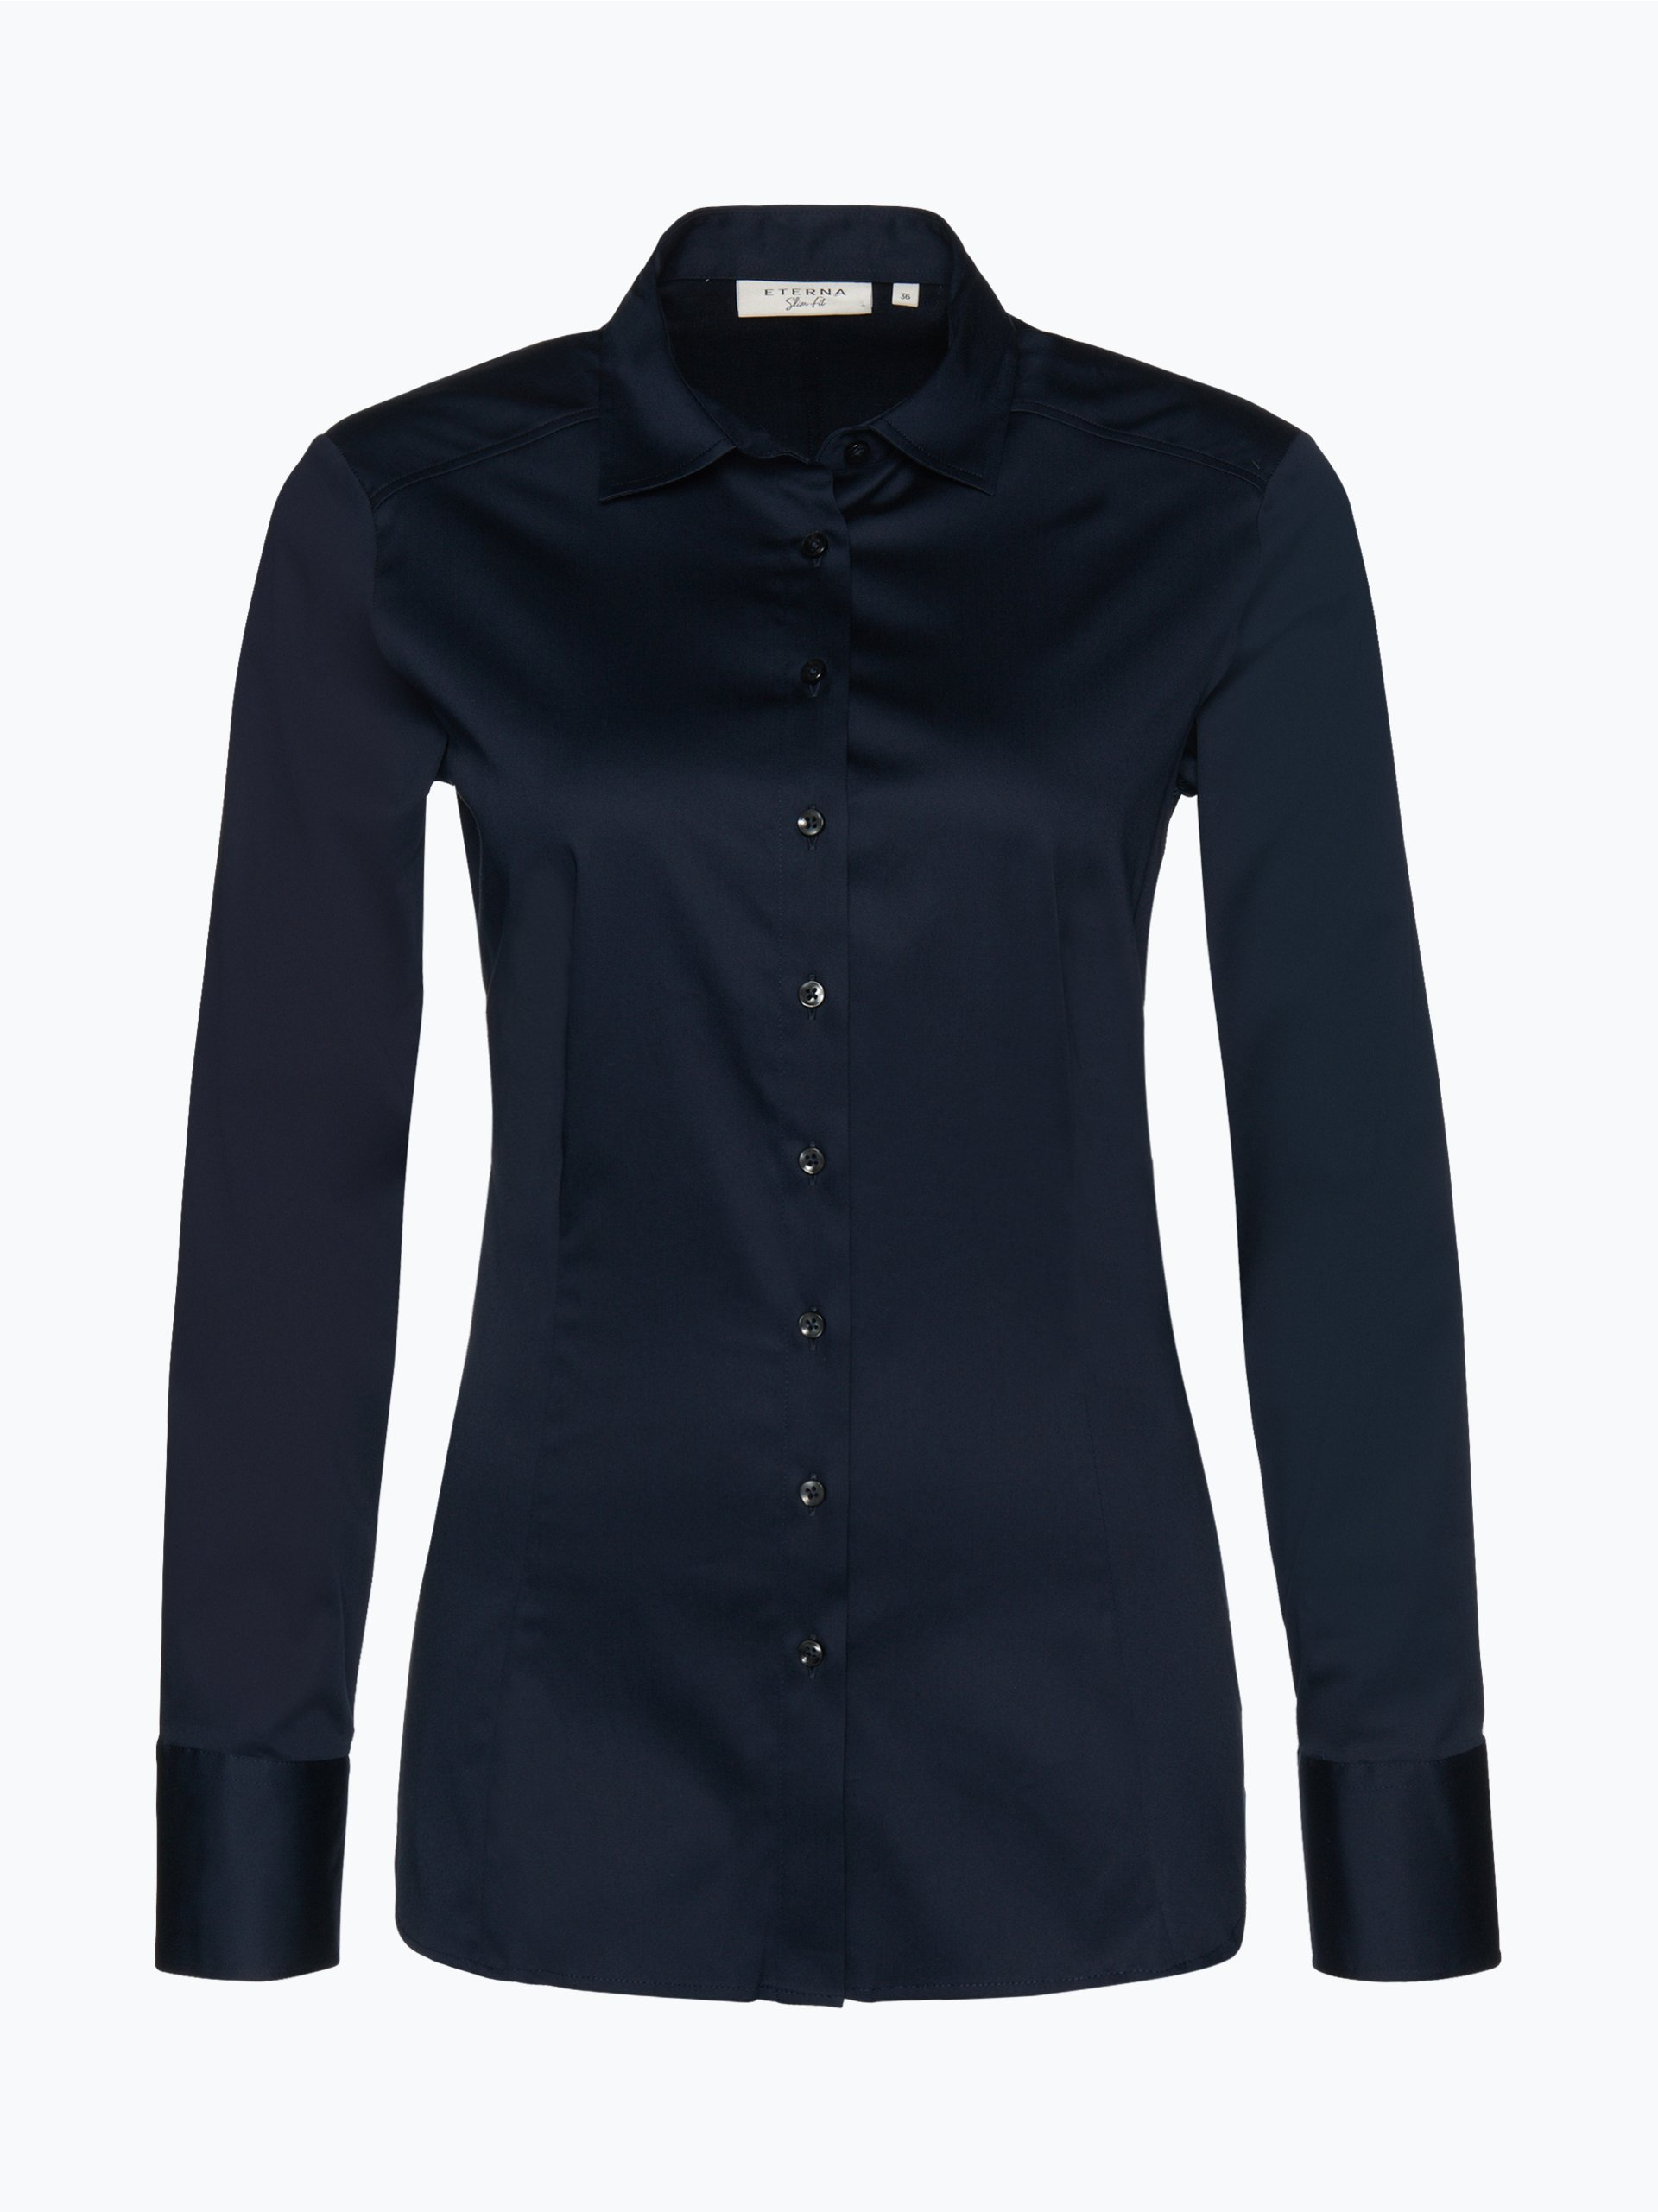 eterna slim fit damen bluse marine uni online kaufen. Black Bedroom Furniture Sets. Home Design Ideas